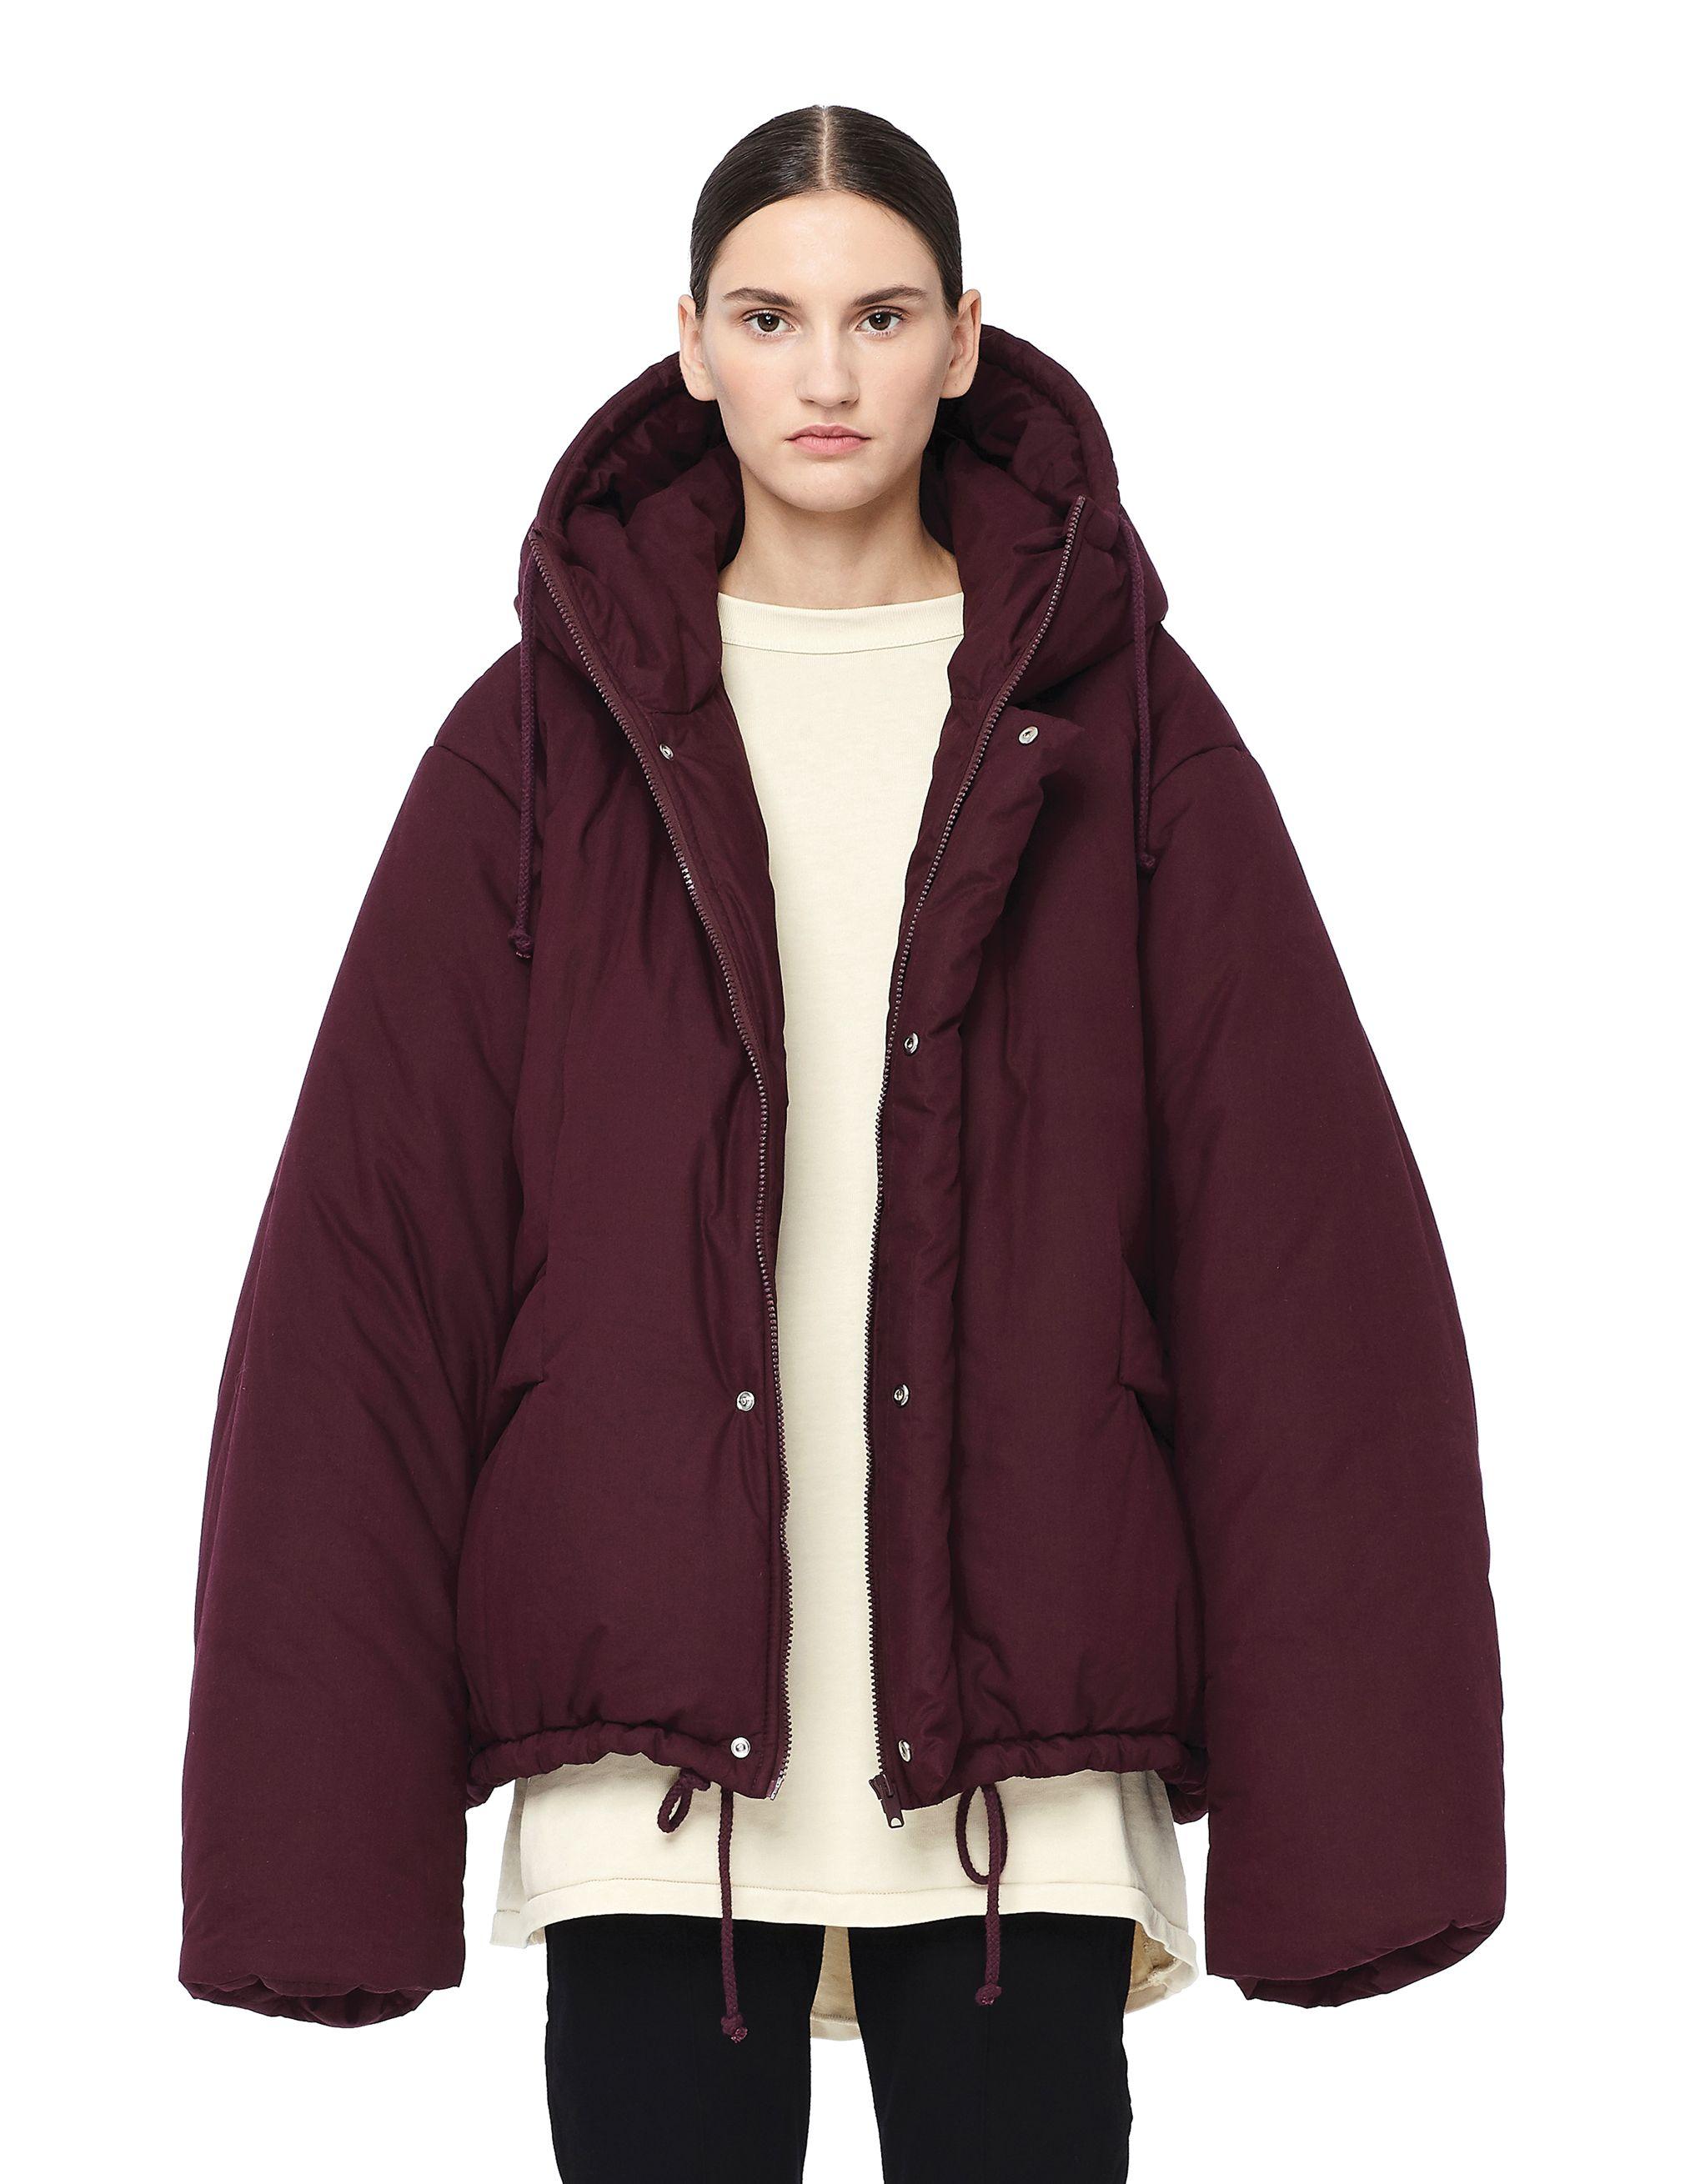 Yeezy Oxblood Short Puffer Jacket In Burgundy Modesens Jackets Short Puffer Jacket Yeezy [ 2620 x 2027 Pixel ]